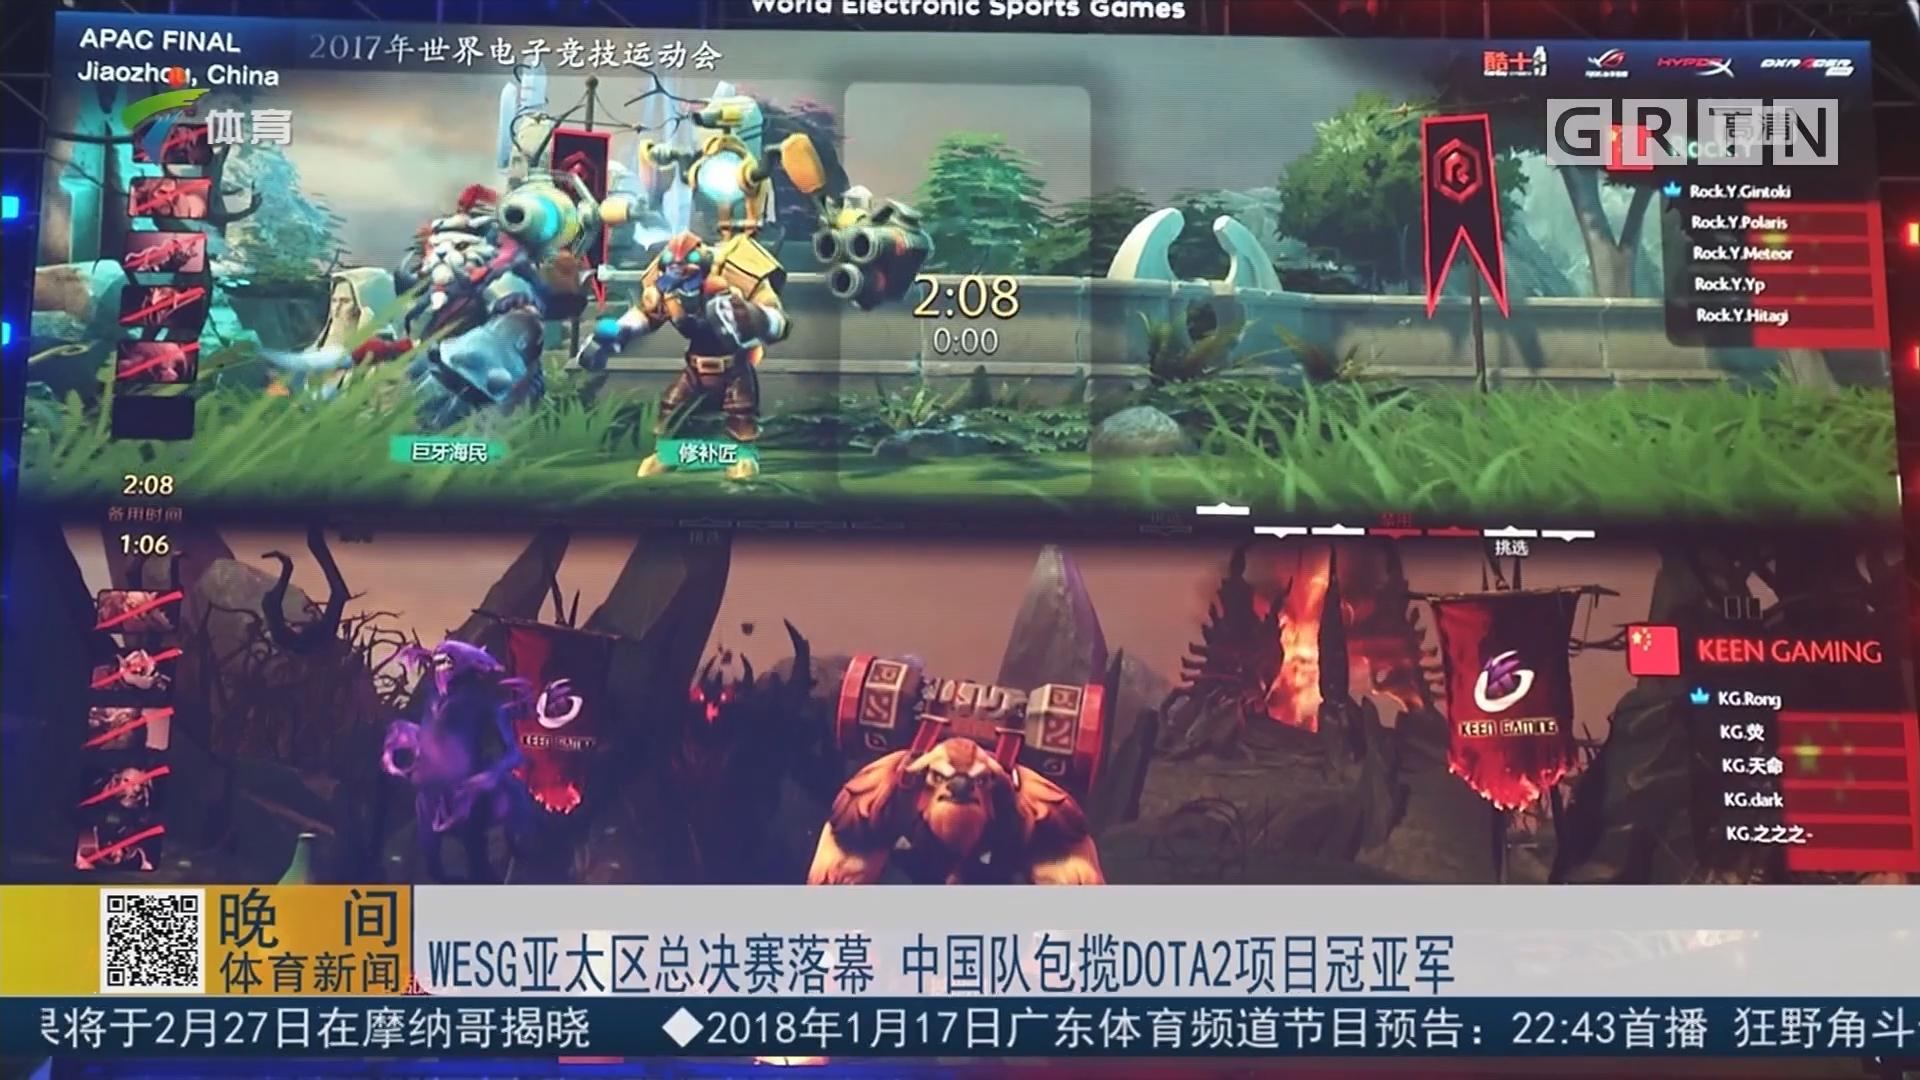 WESG亚太区总决赛落幕 中国队包揽DOTA2项目冠亚军